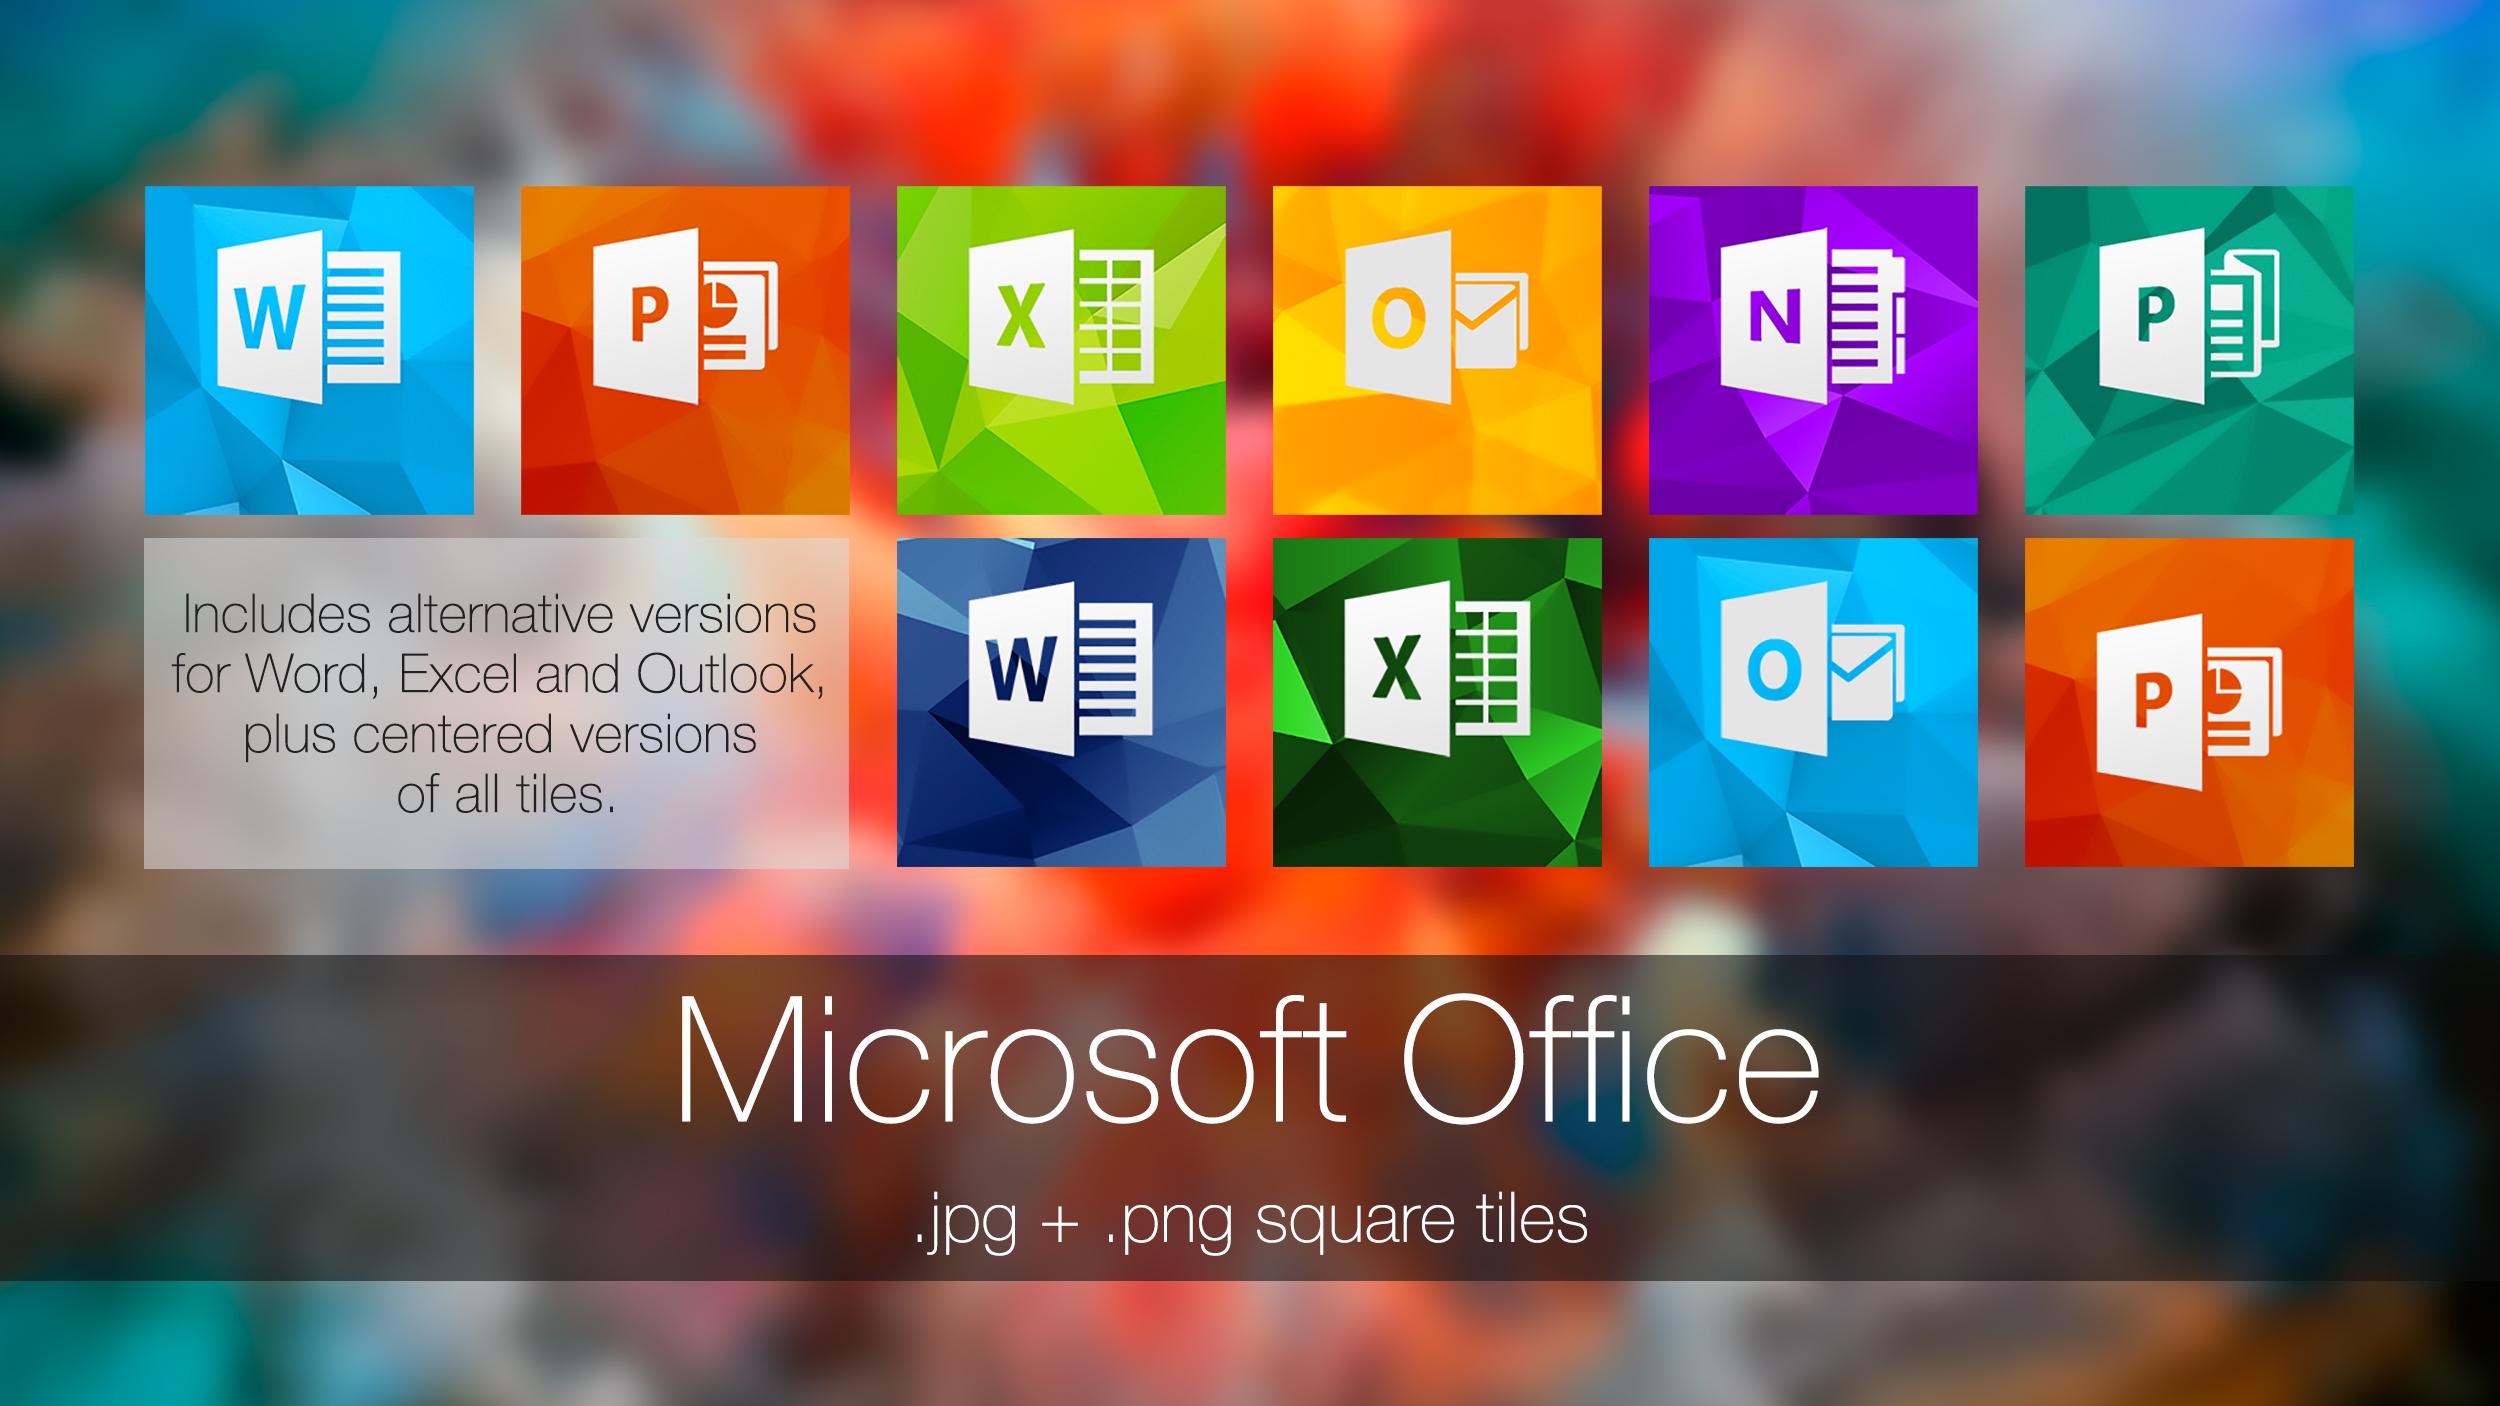 Microsoft Office Square Tiles By Javijavo93 On Deviantart